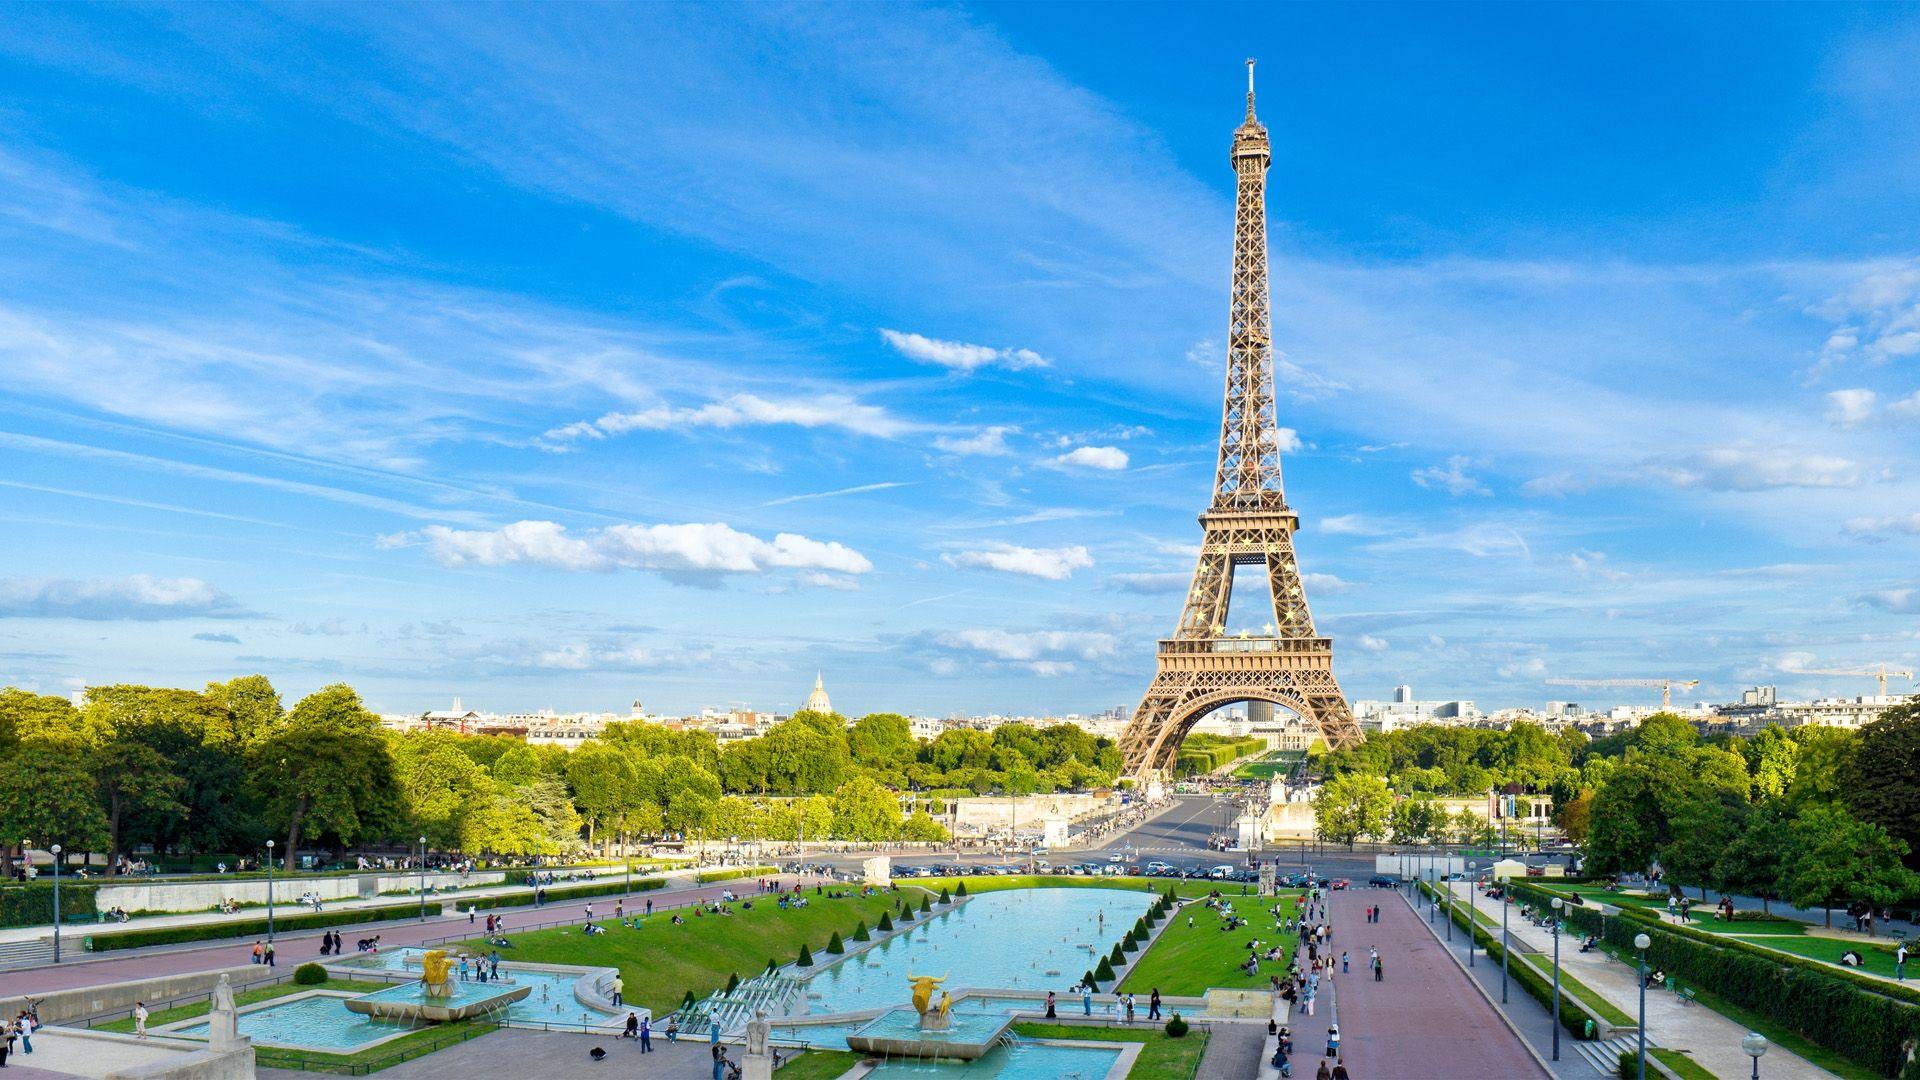 1920x1080 Wallpaper Paris France Eiffel Tower Sky Blue